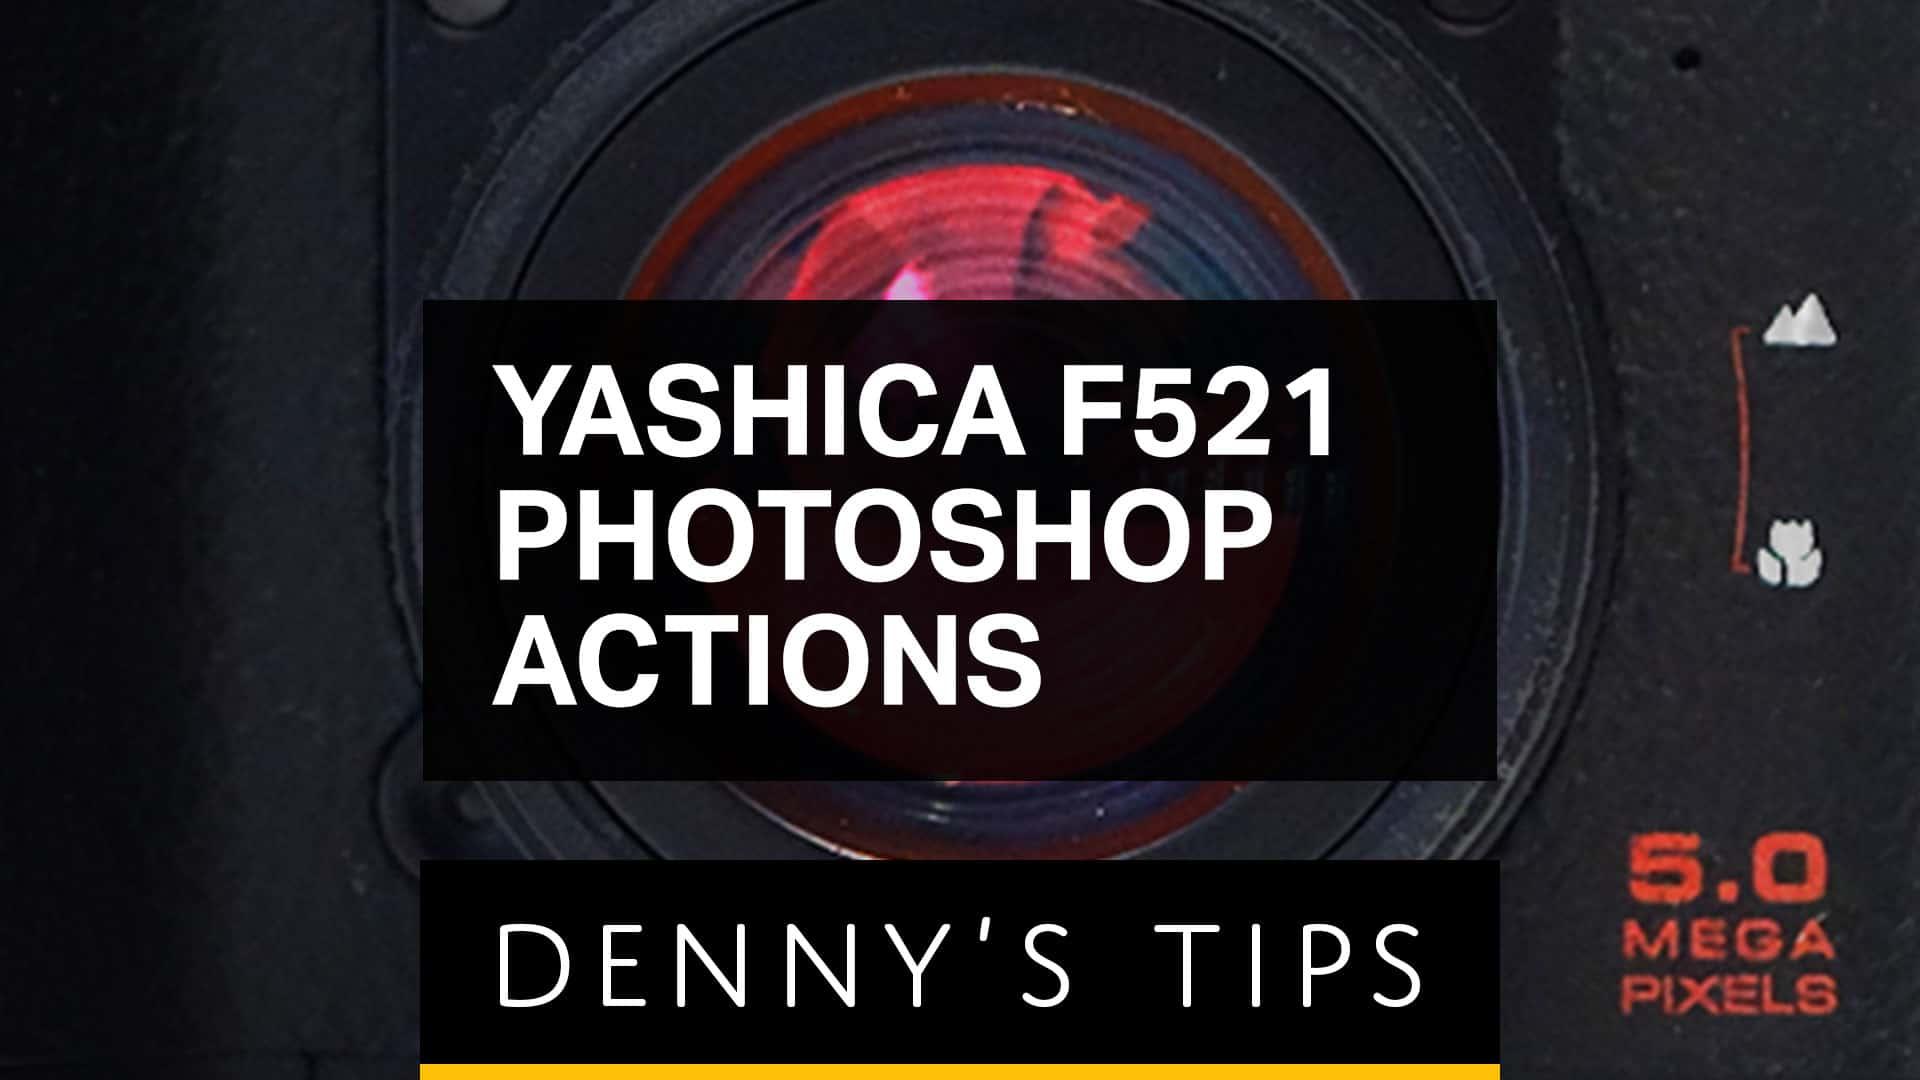 Yashica F521 Photoshop Actions